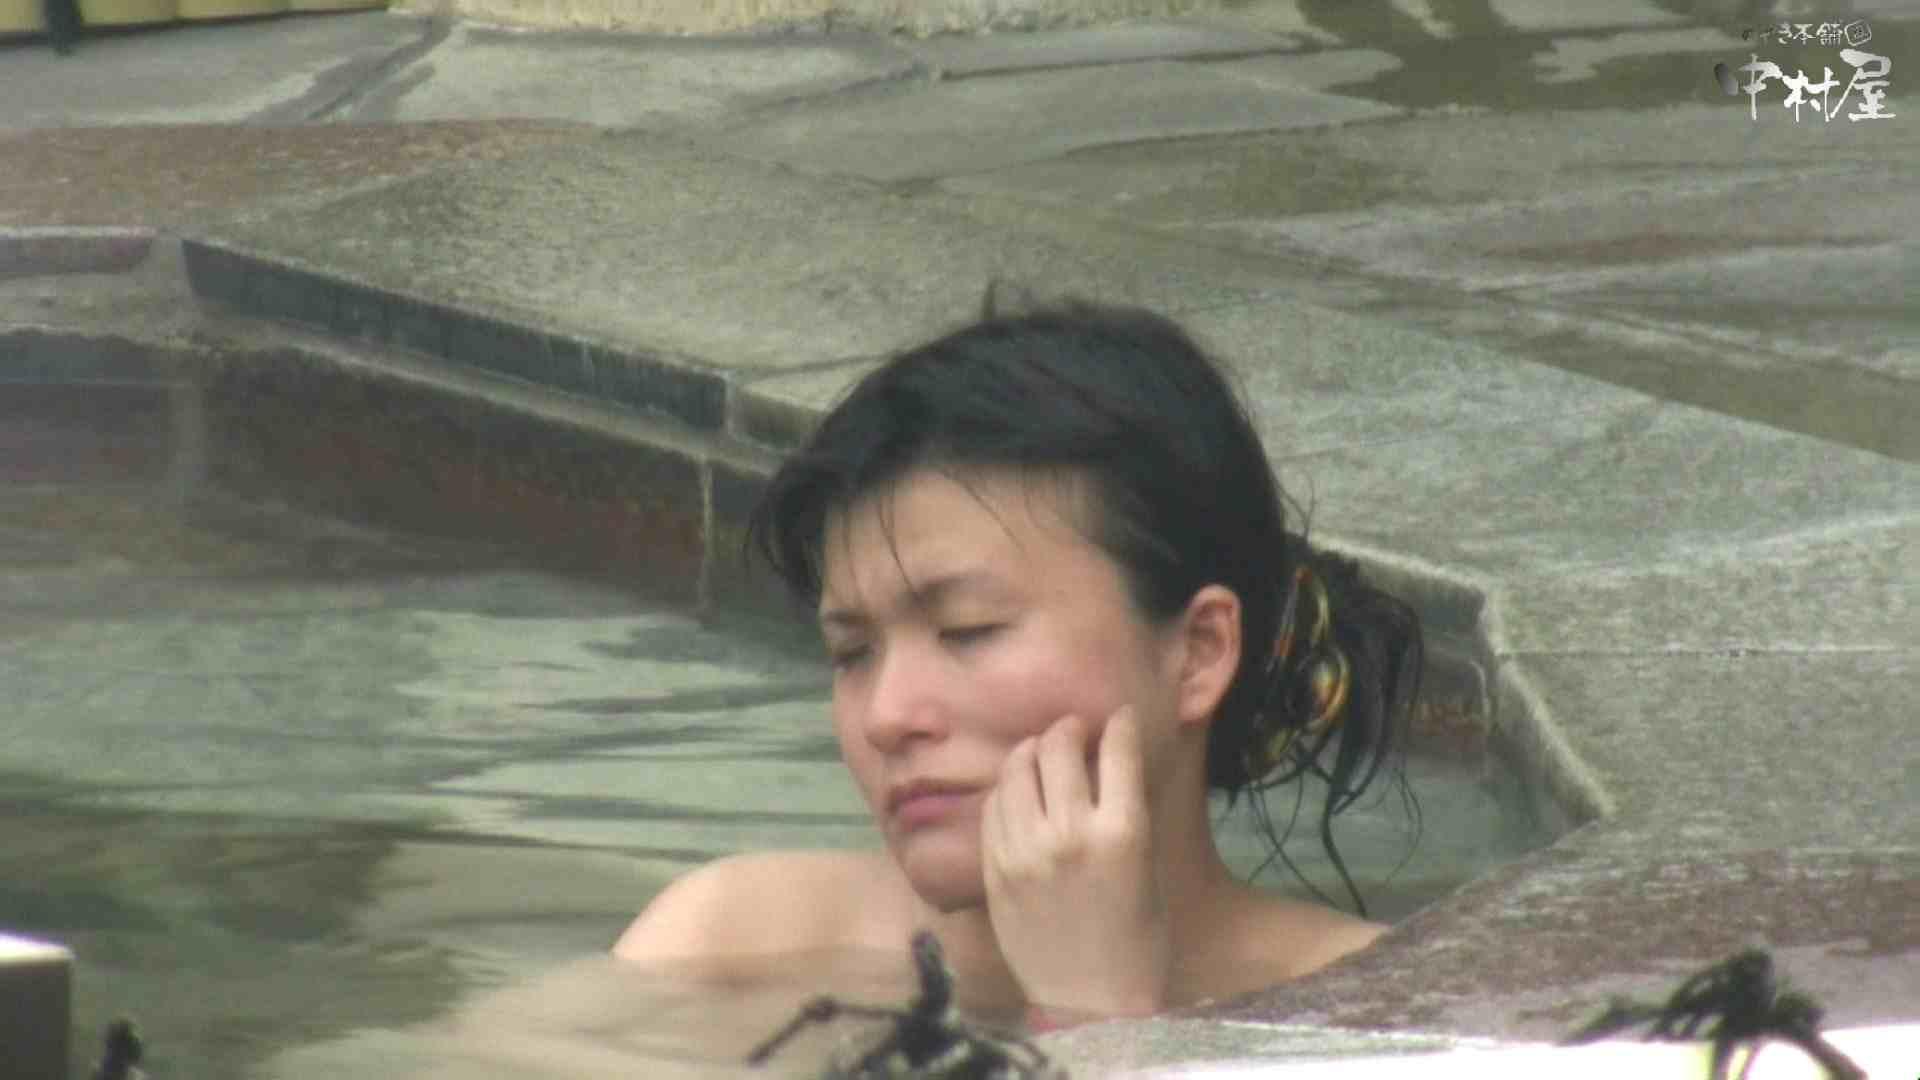 Aquaな露天風呂Vol.894 盗撮師作品 セックス画像 93pic 59